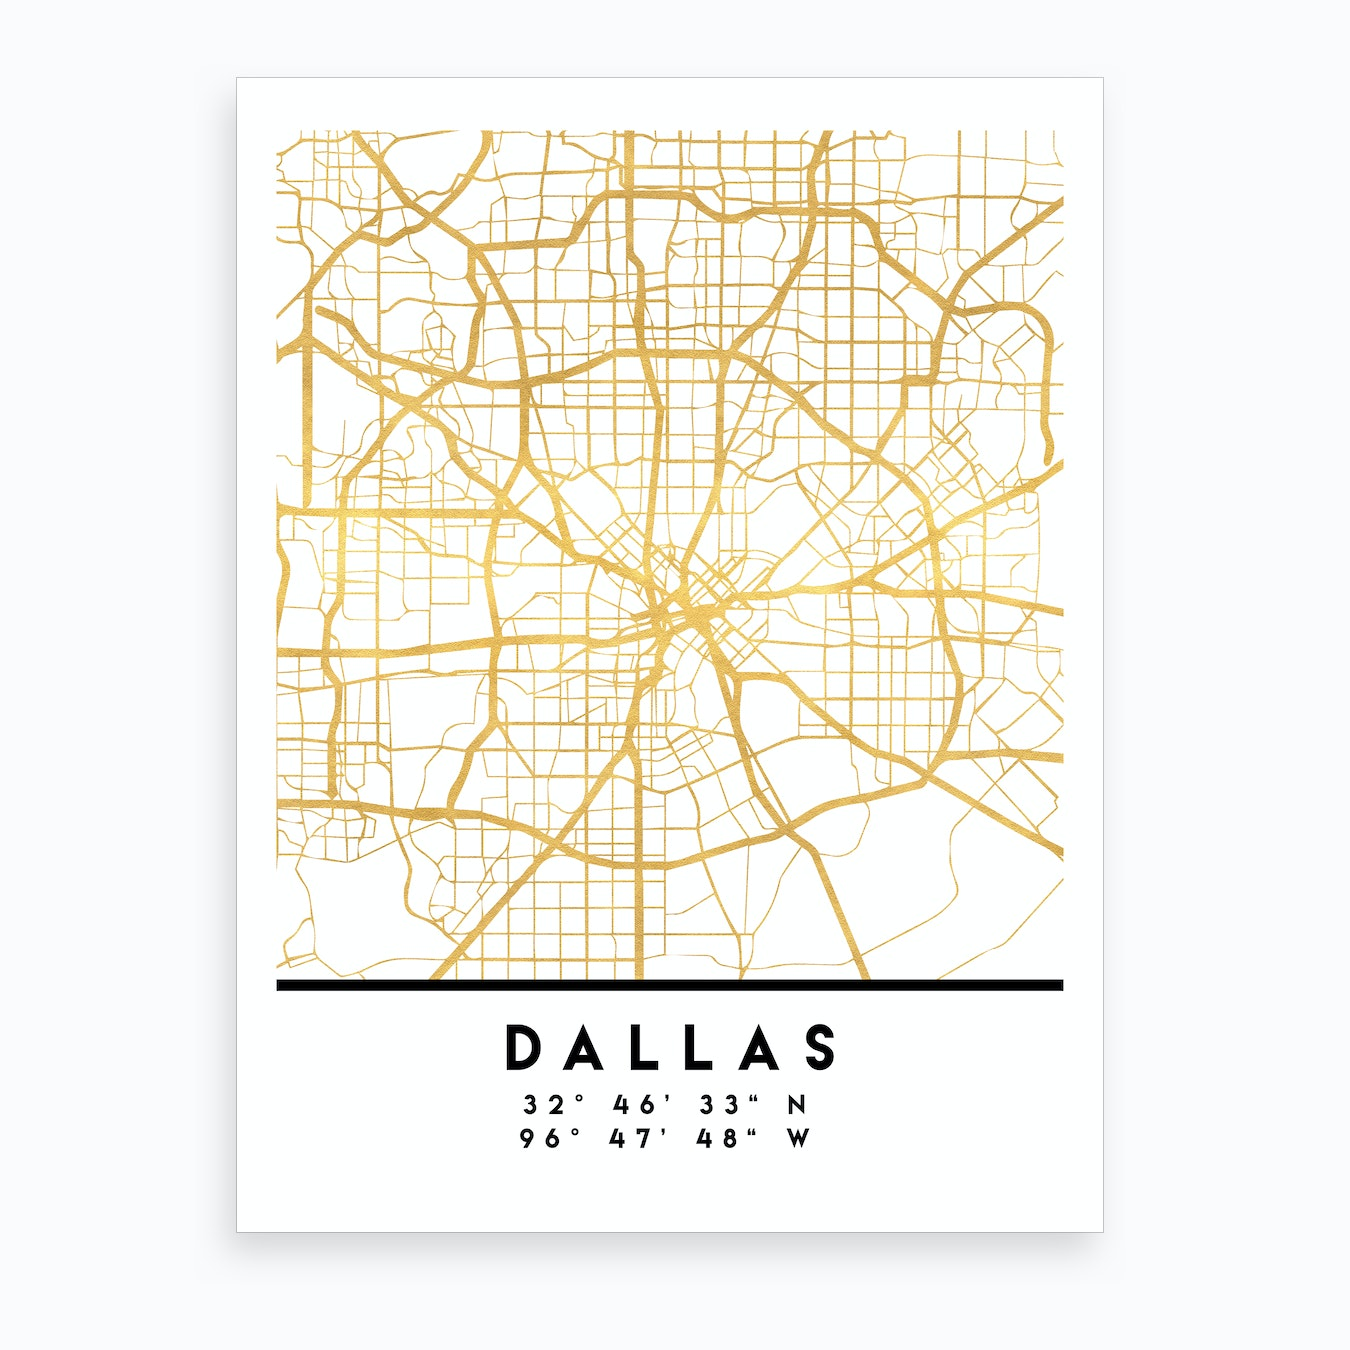 Map Of Texas City.Dallas Texas City Street Map